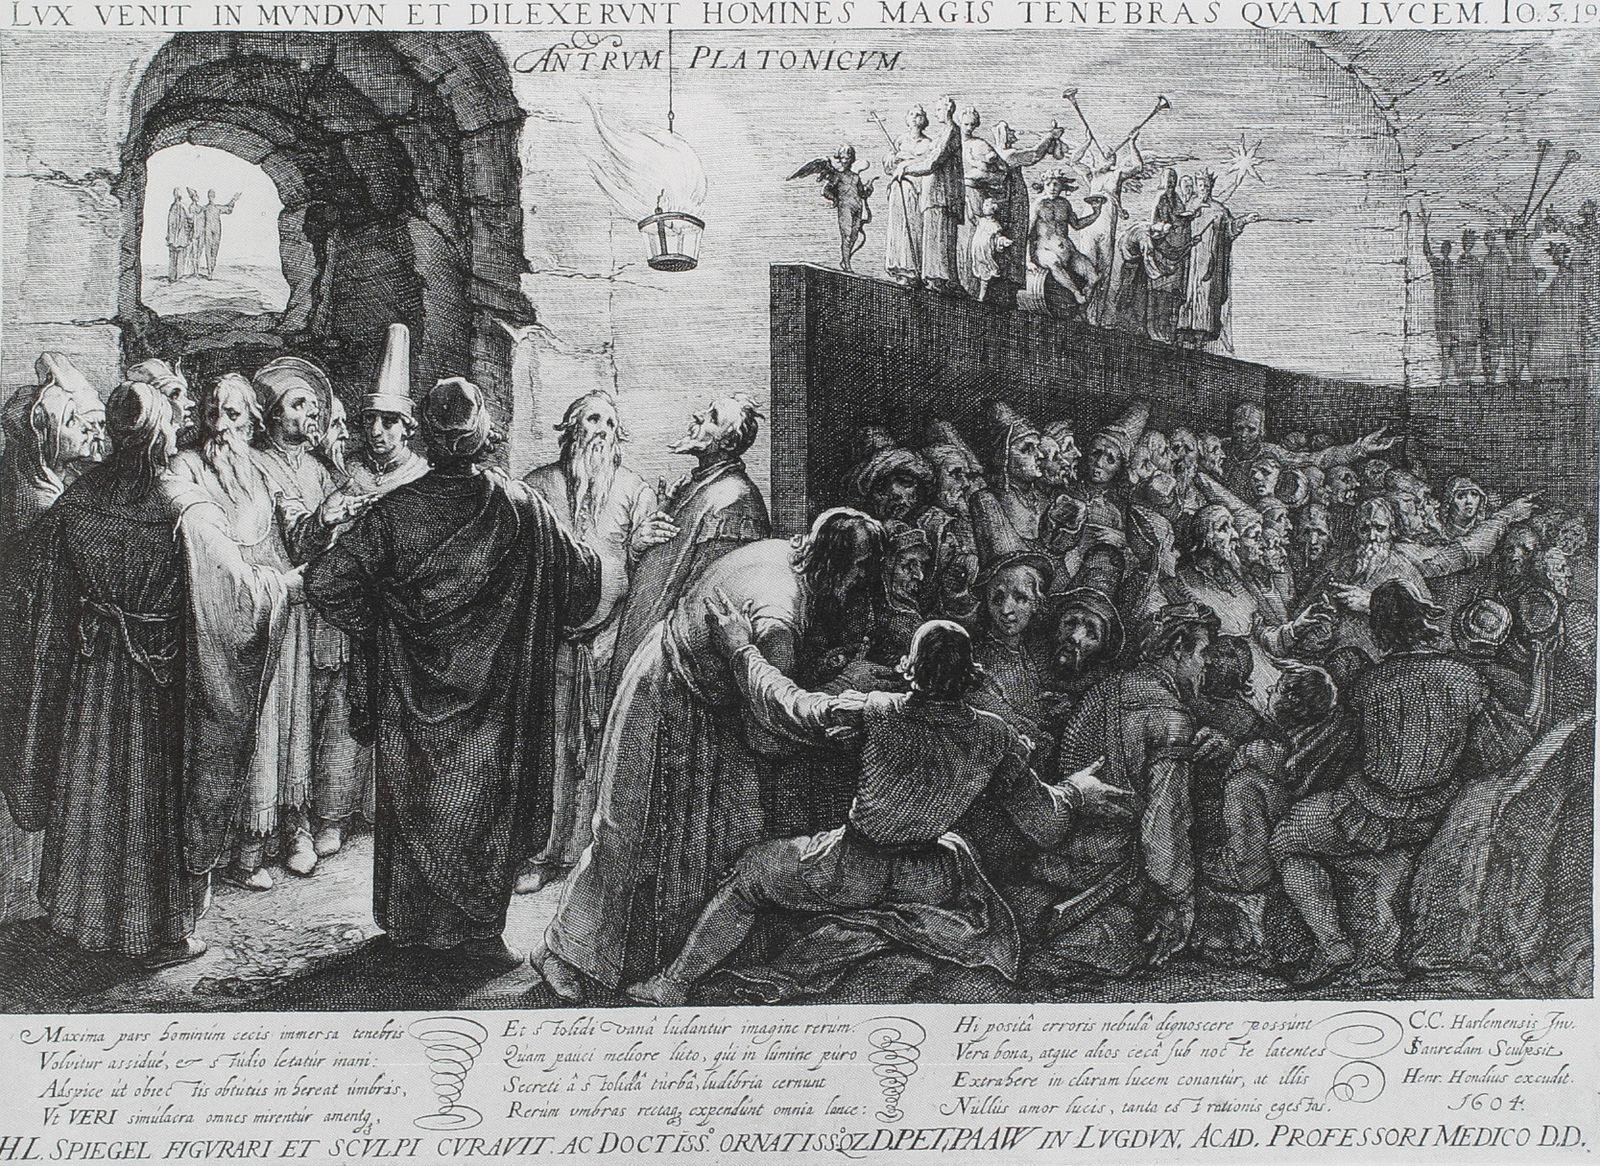 Platon Cave Sanraedam 1604 - Allegory of the Cave - Wikipedia ...